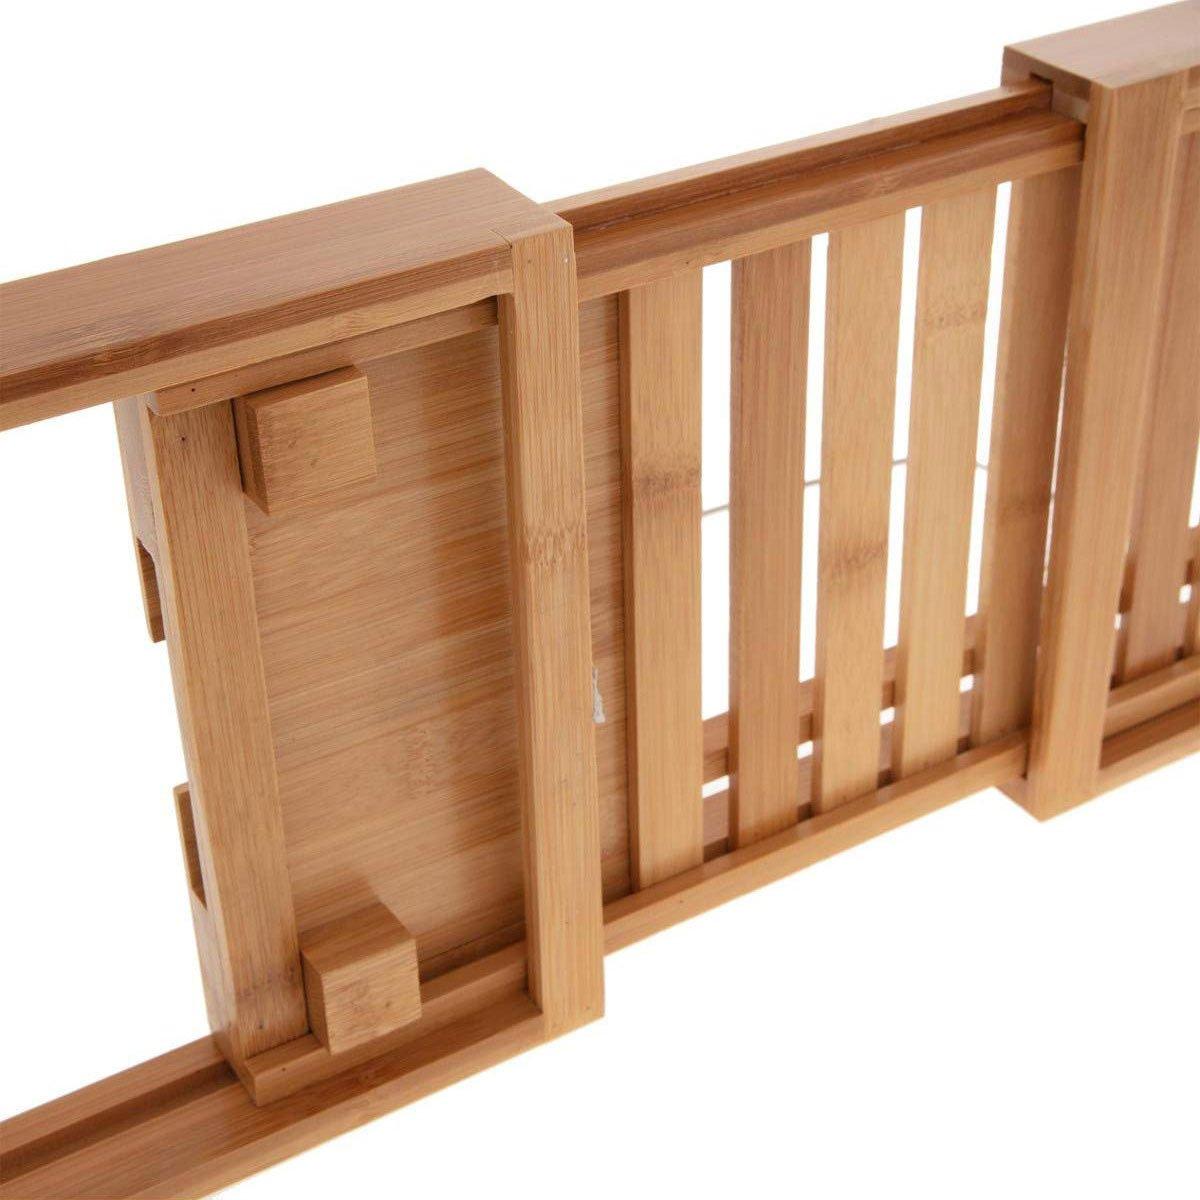 Bambus ausziehbar cm für Badewanne Kollektion Naturéo Tablett